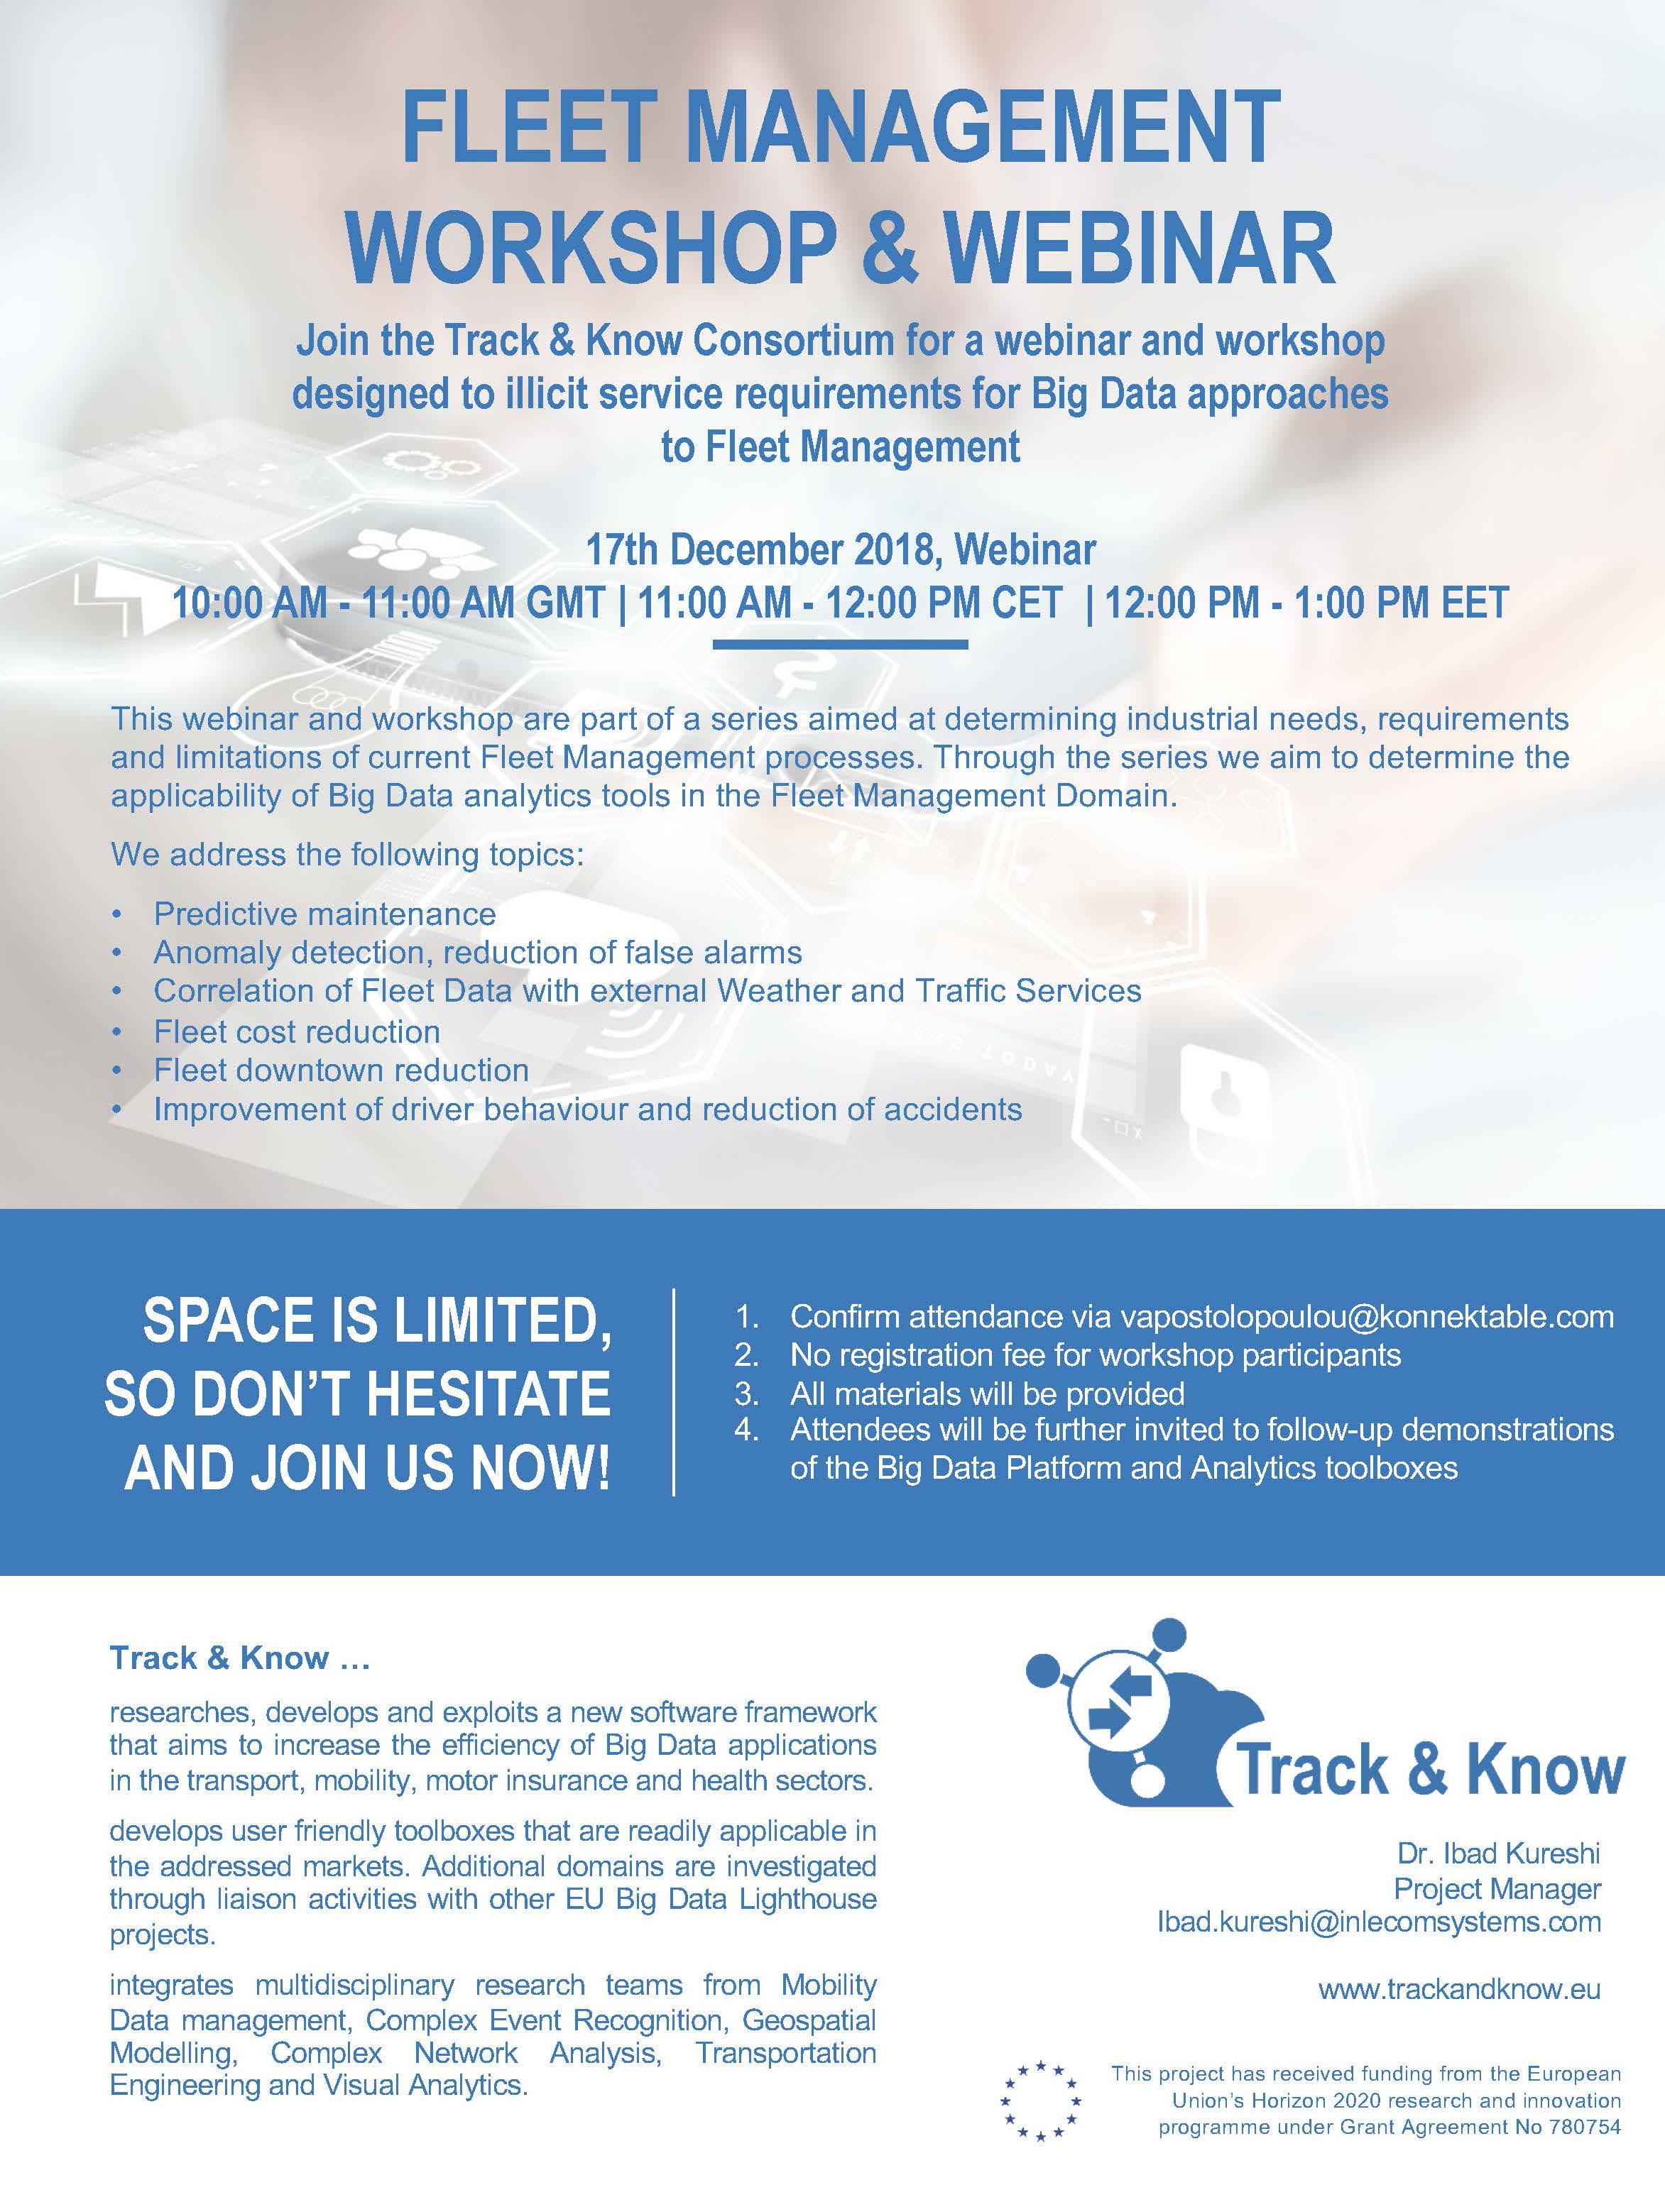 Track&Know Workshop and Webinars - Big Data in Fleet